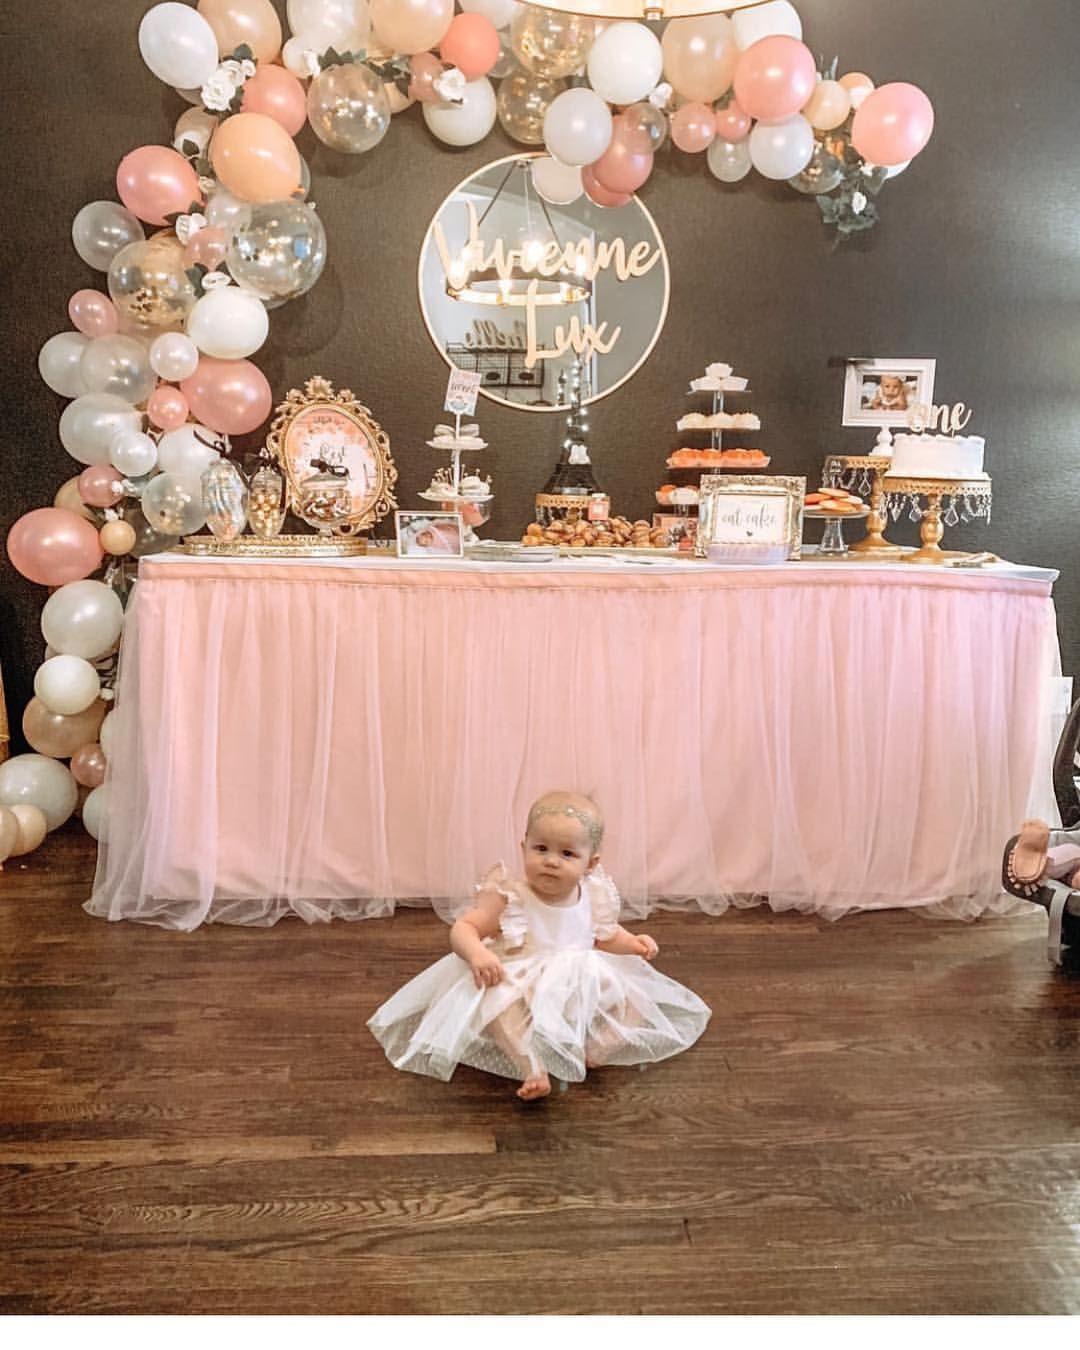 418 Likes 24 Comments Neena Joy Marie Clothing Joymarieclothing On Instag Girl Birthday Decorations Baptism Decorations Girl 1st Birthday Party For Girls